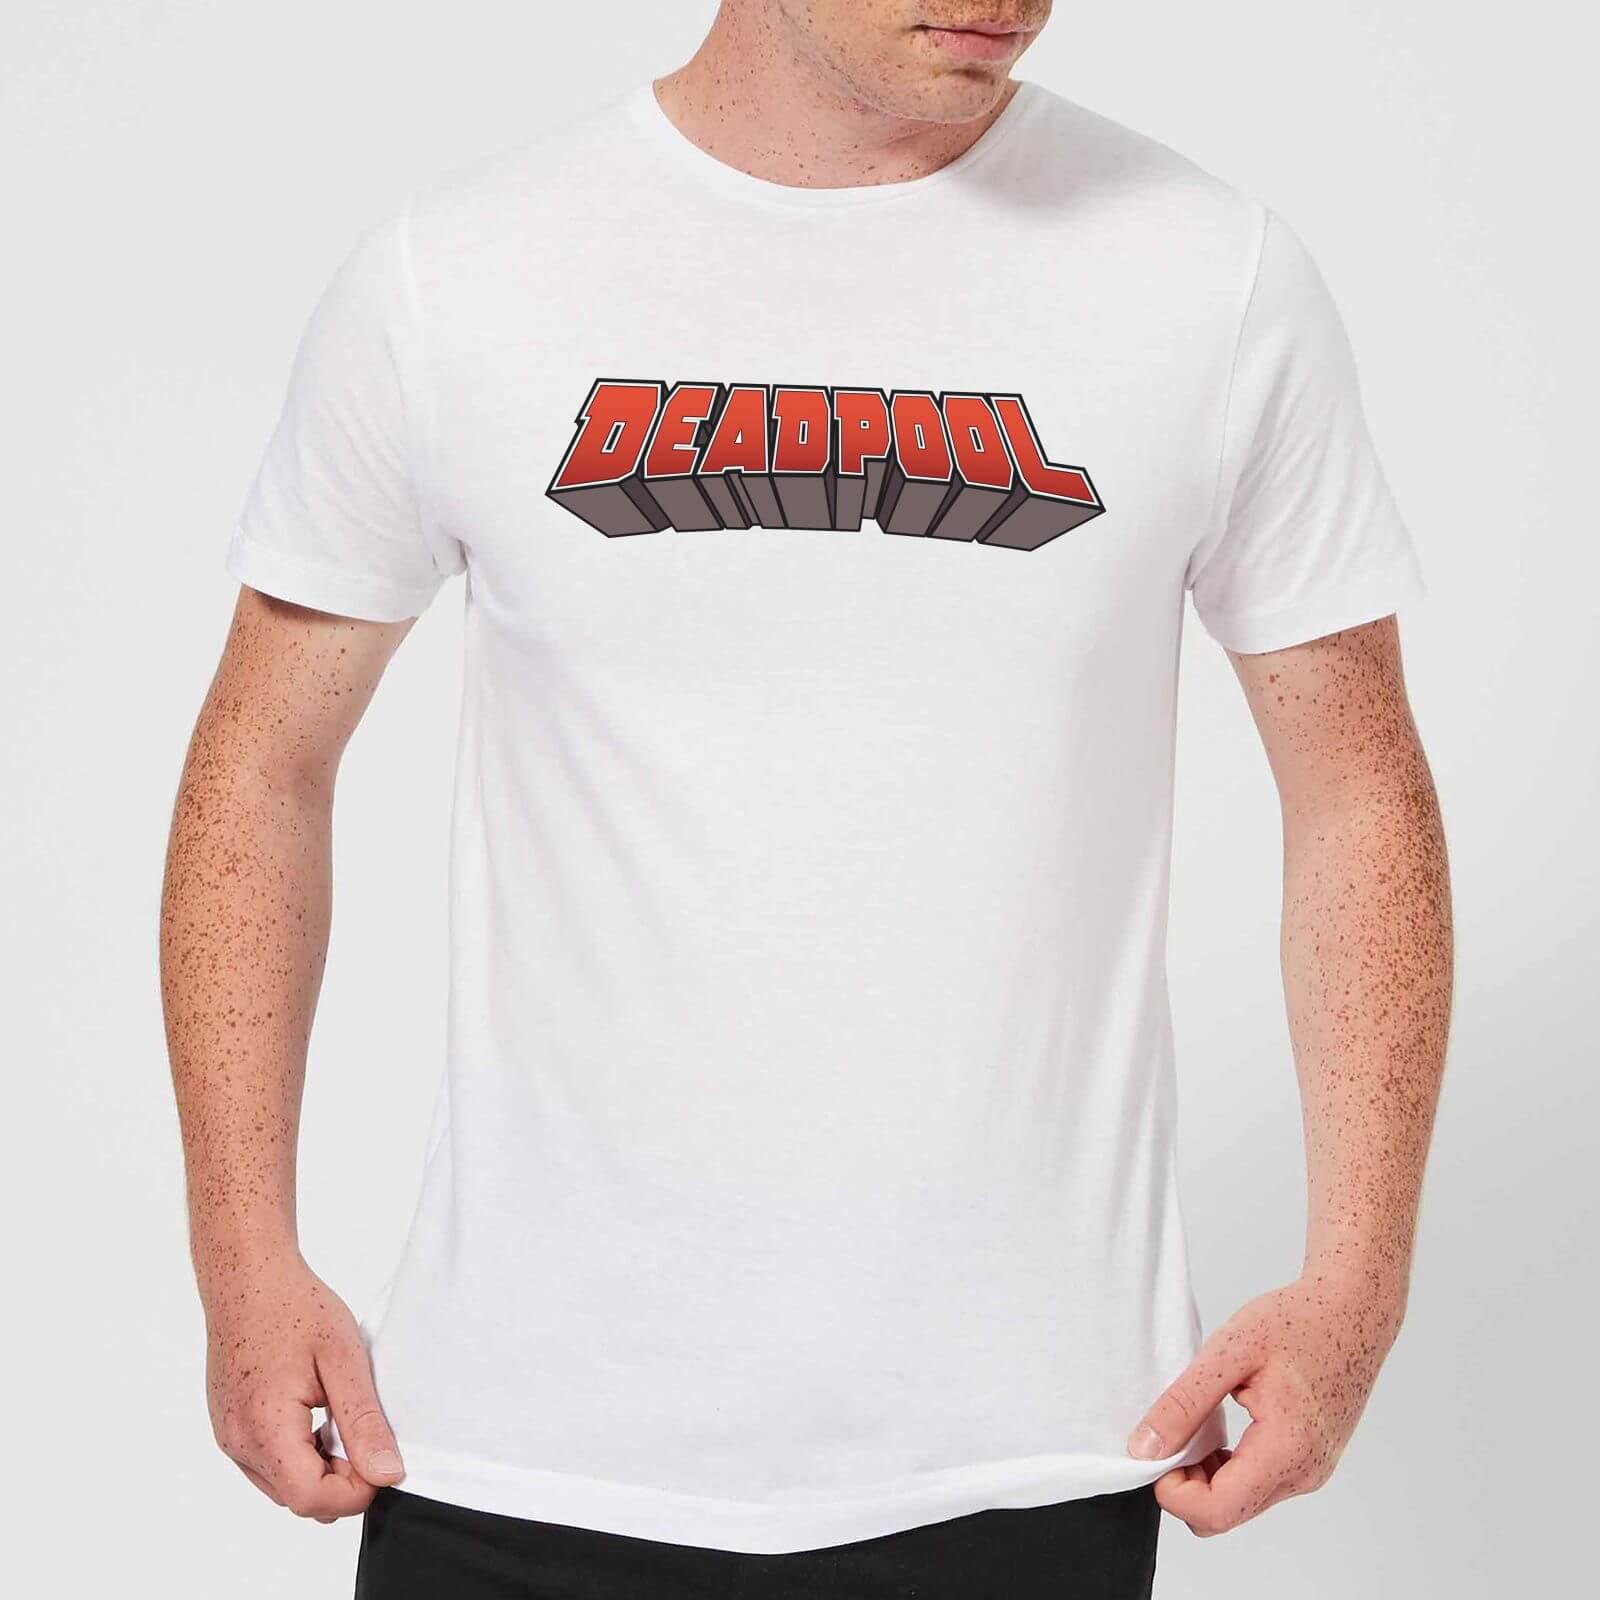 OfferteWeb.click 07-t-shirt-marvel-deadpool-logo-bianco-uomo-s-bianco